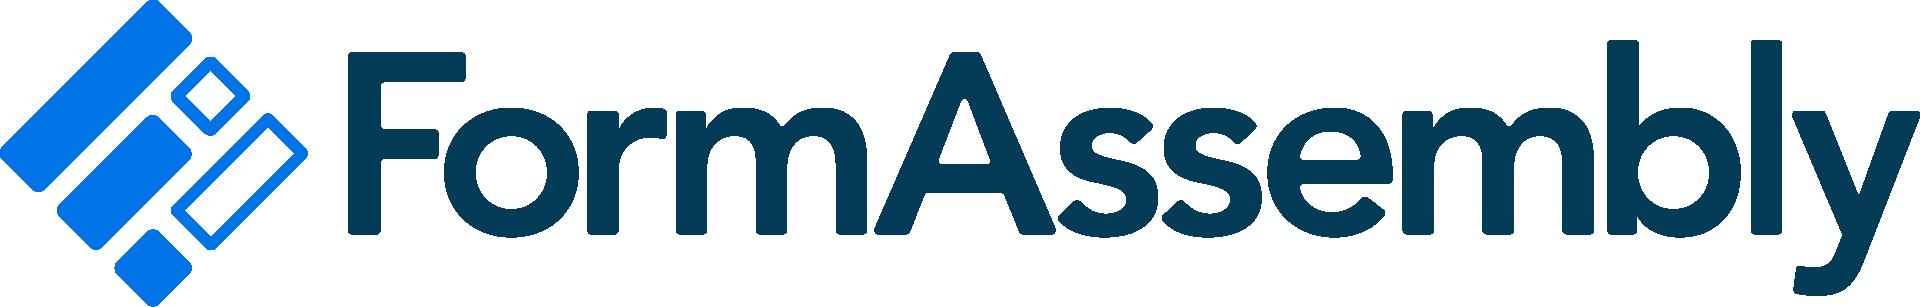 FormAssembly logo